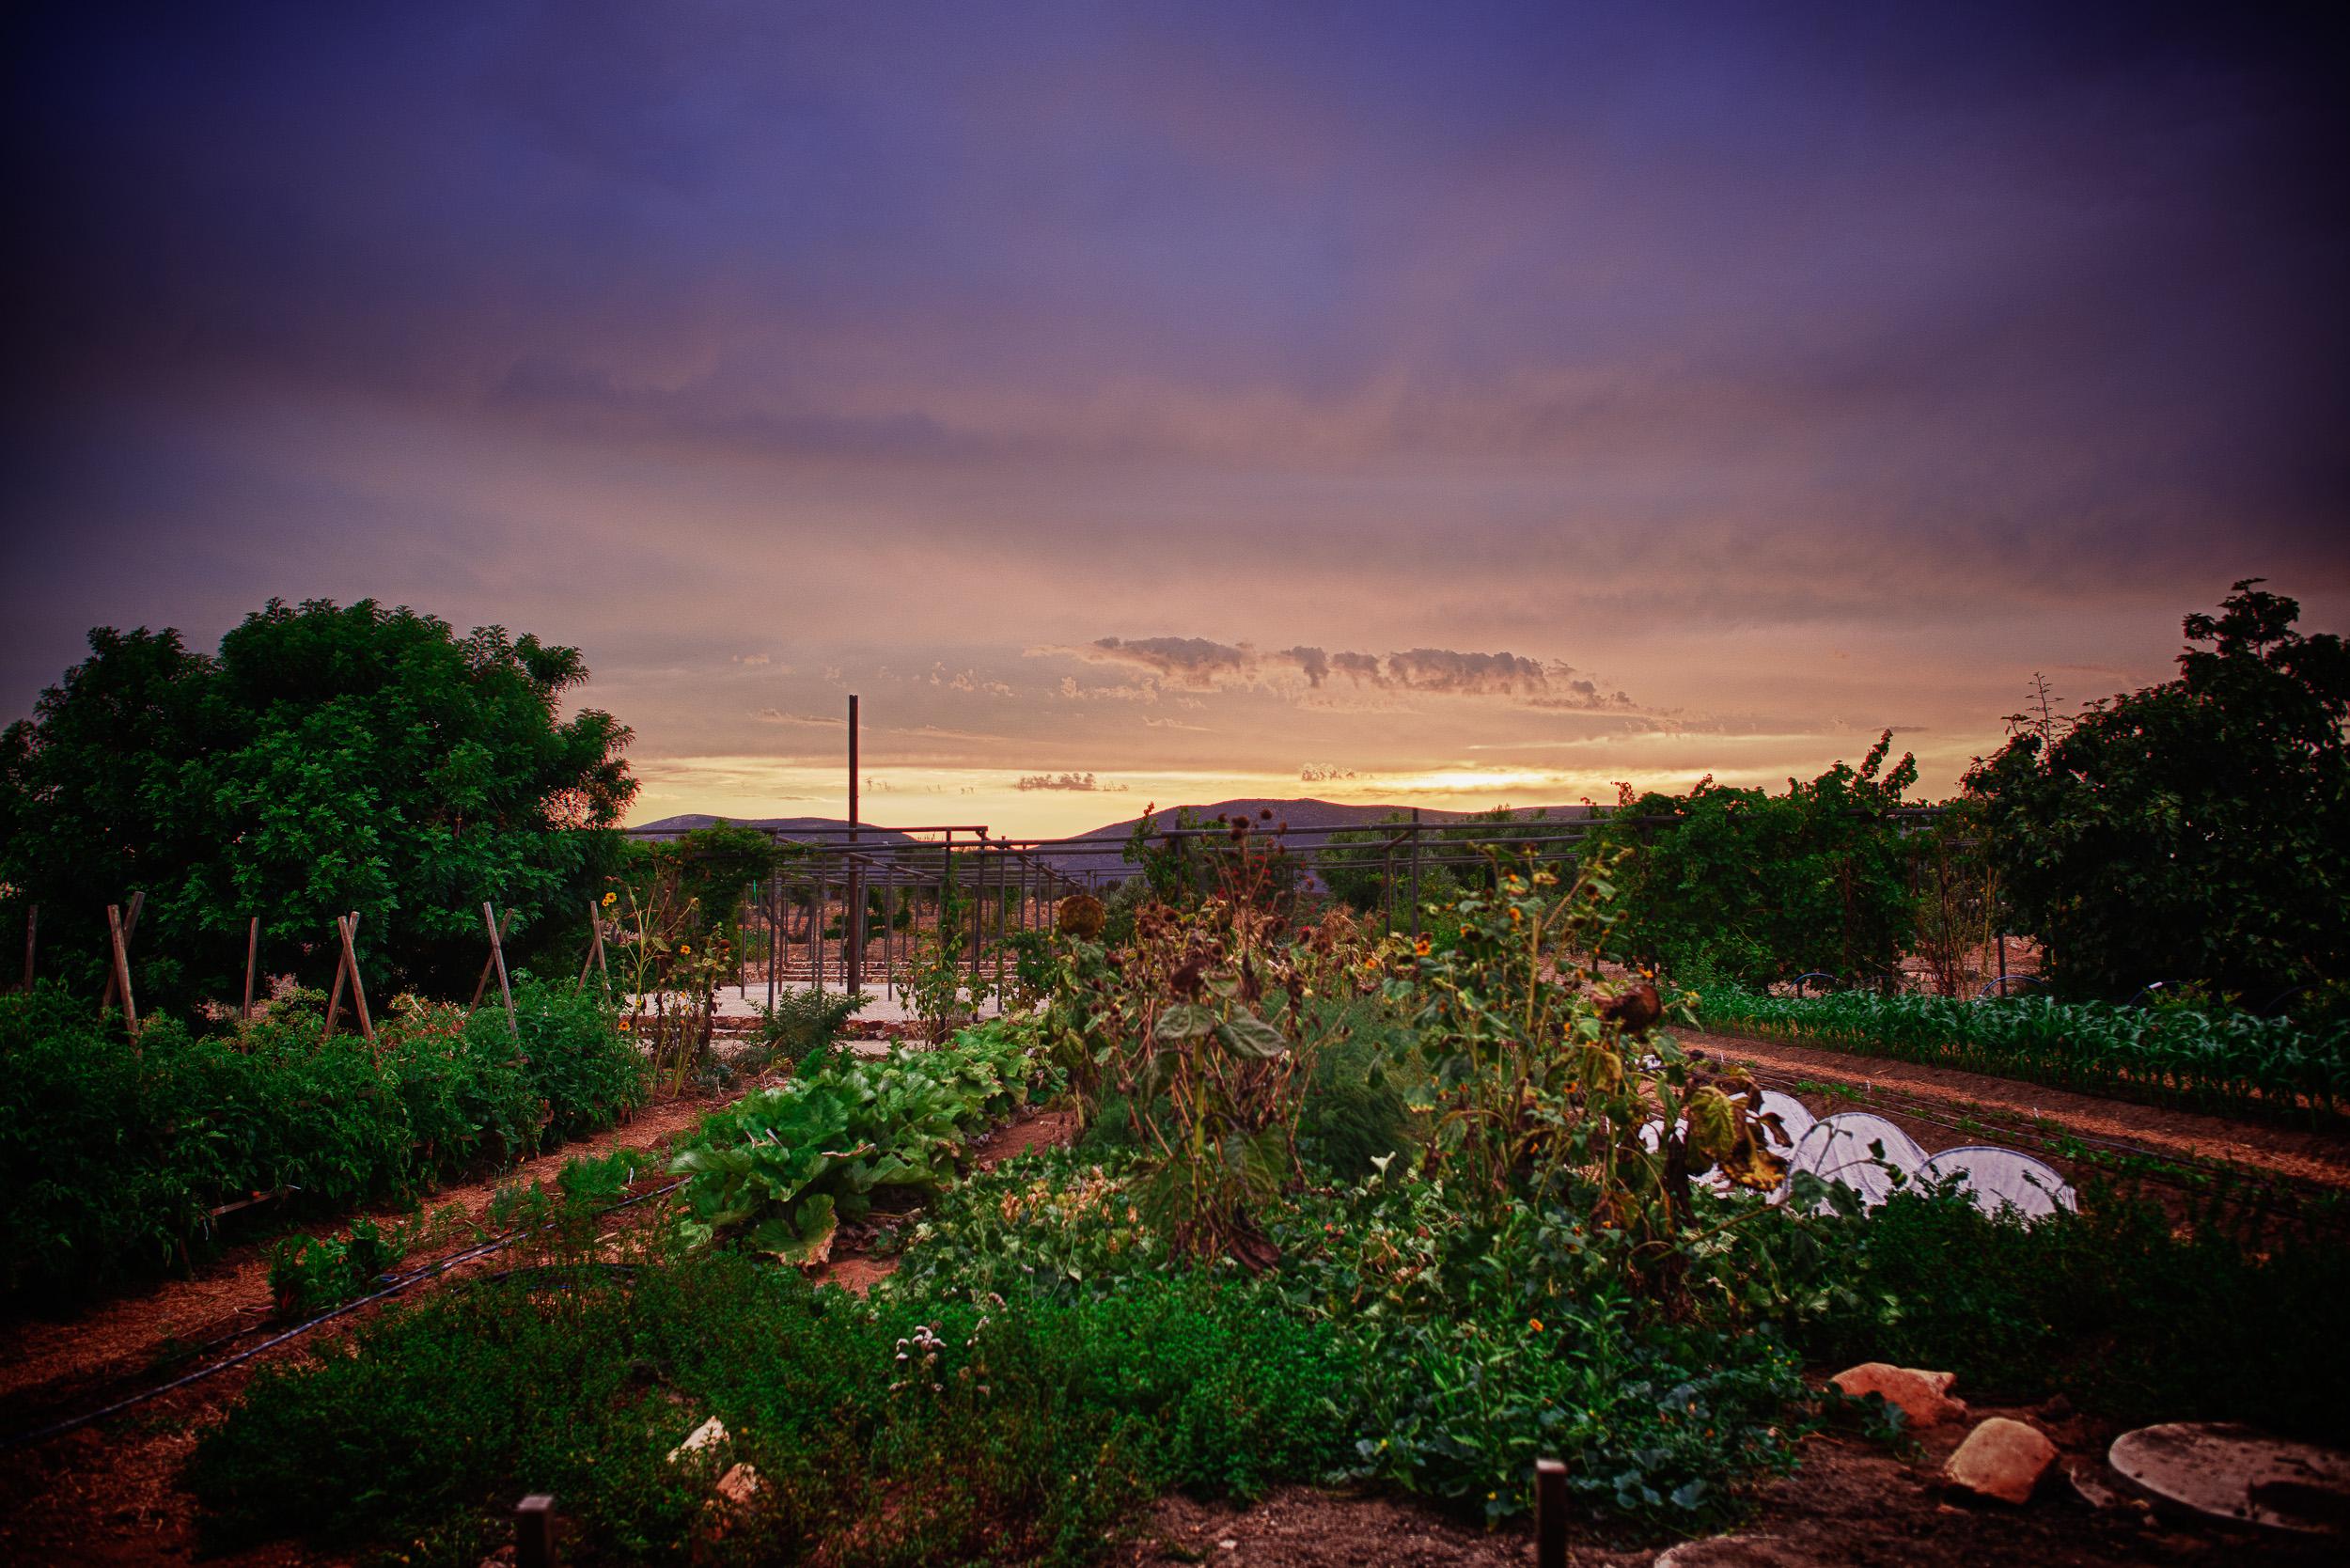 Sunset, Corazón de Tierra, 2012